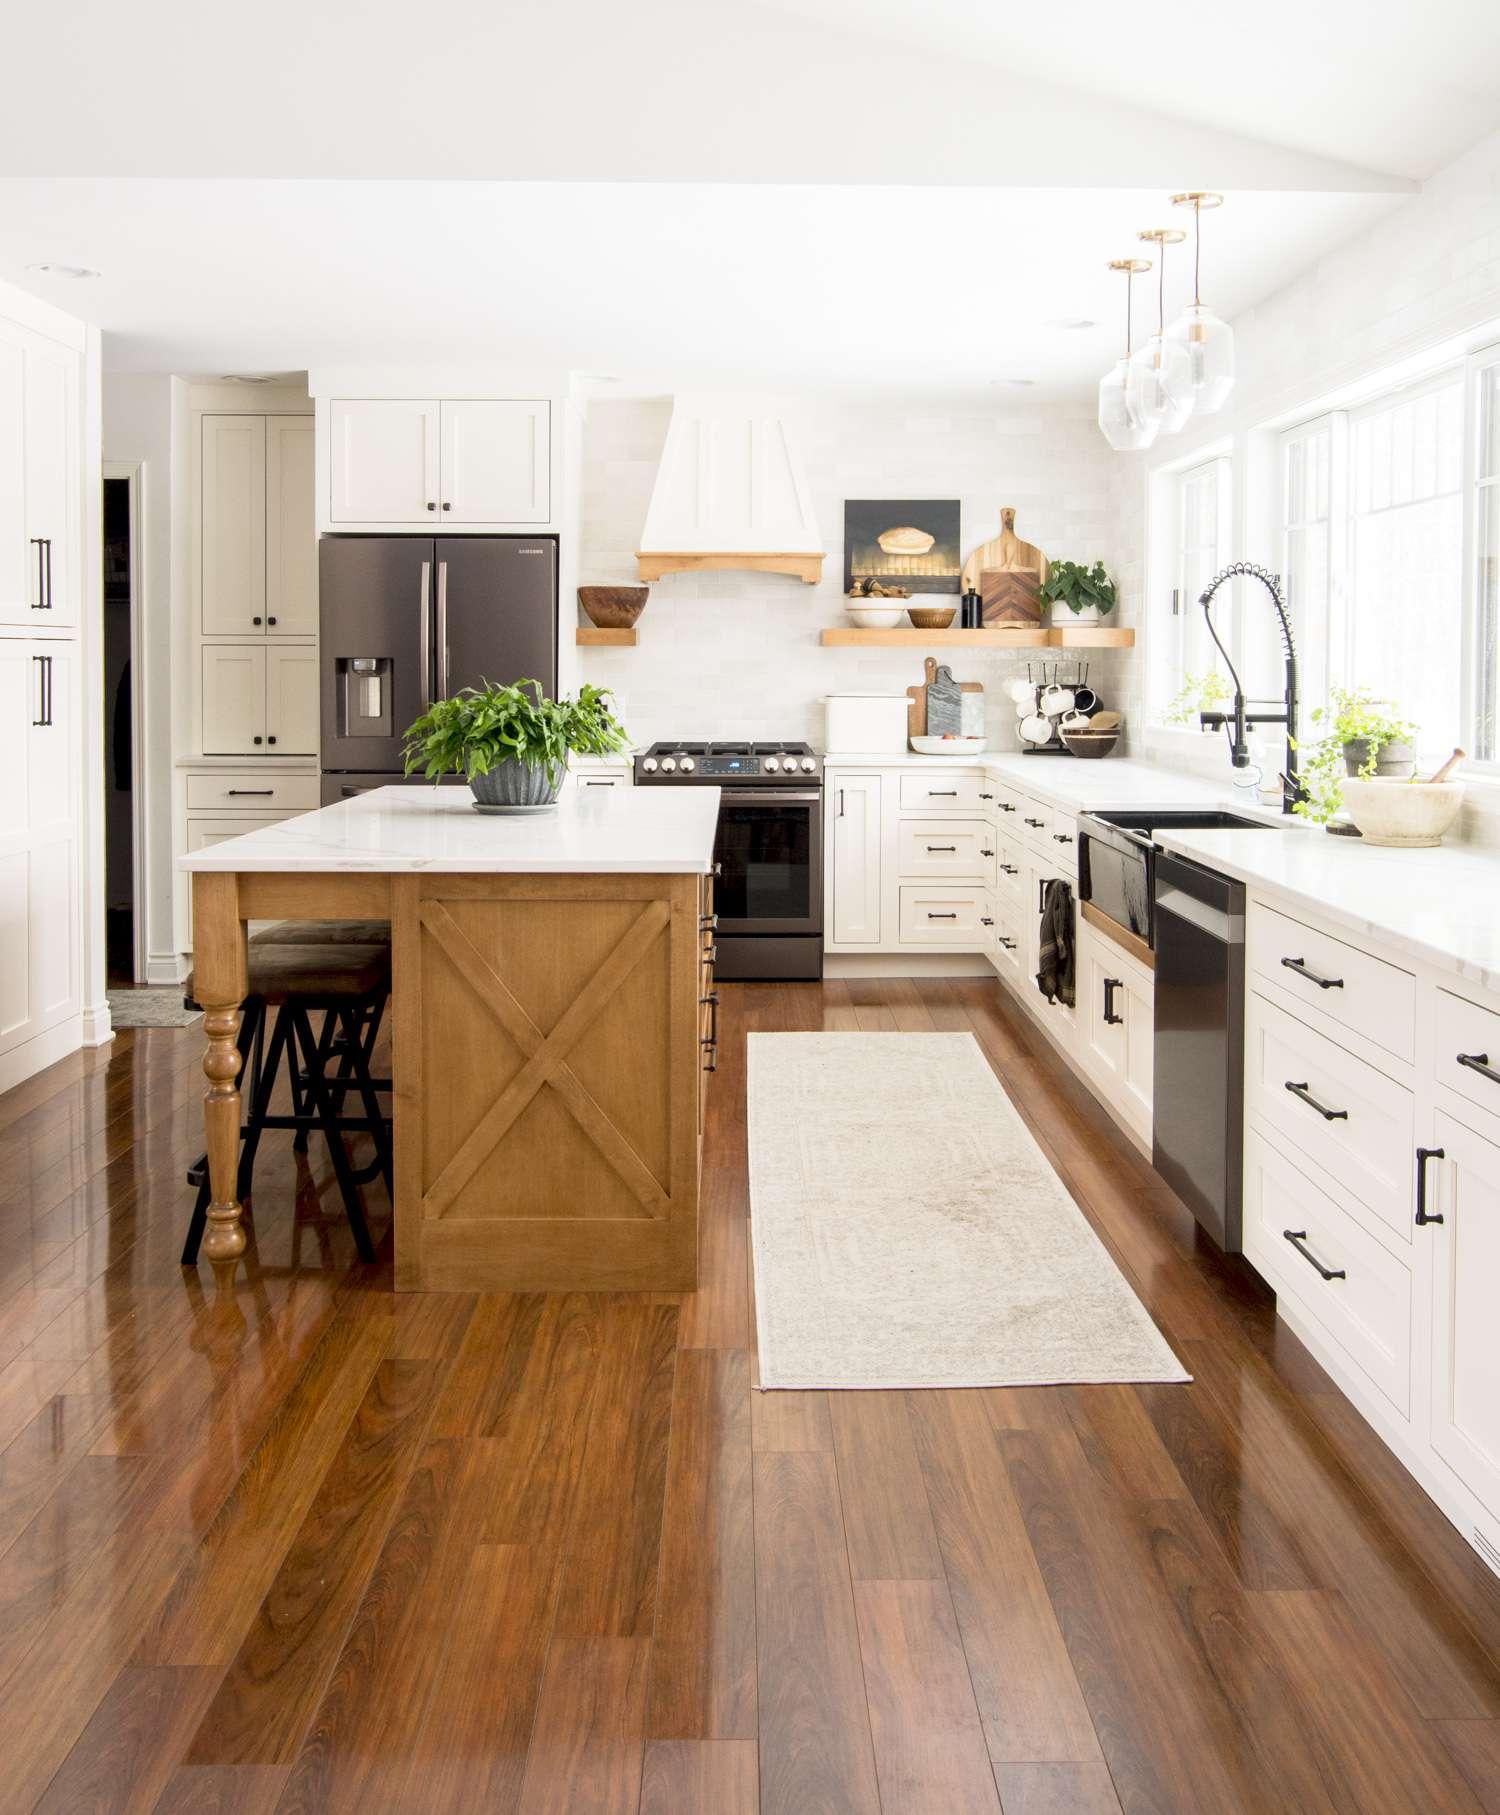 Modern farmhouse kitchen island design.